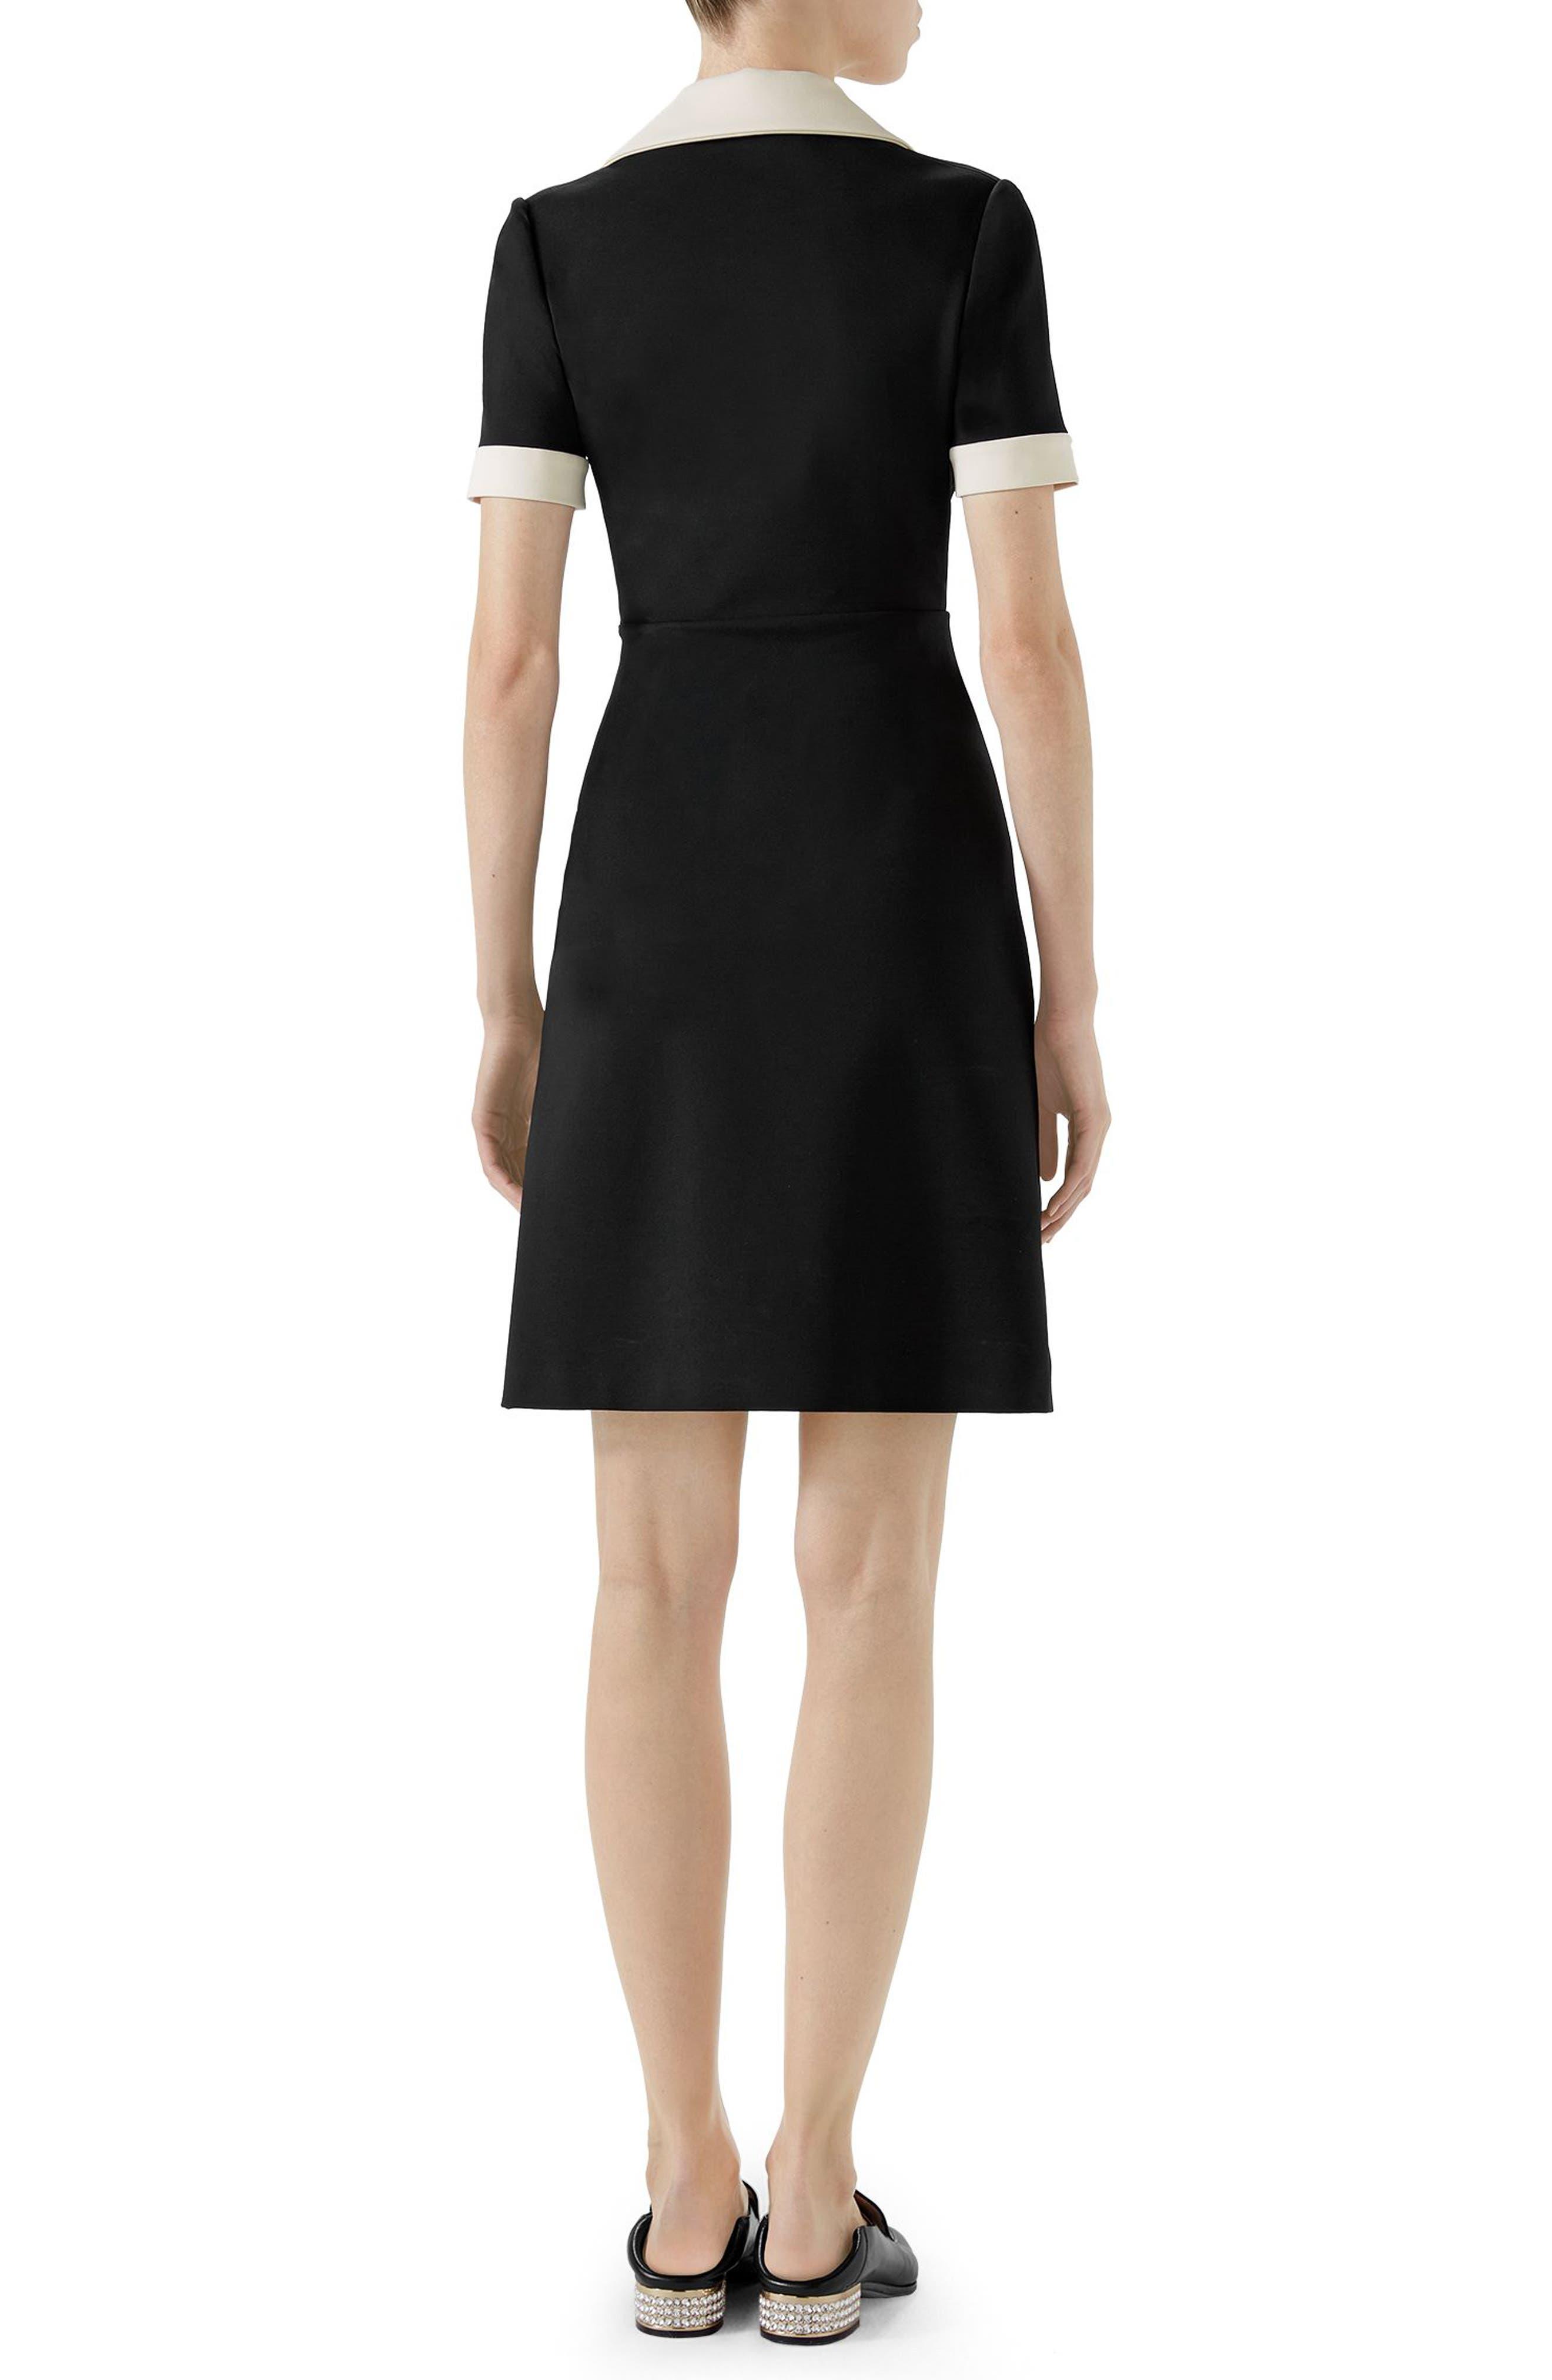 Tiger Button Contrast Trim Jersey Dress,                             Alternate thumbnail 2, color,                             BLACK/ ALMOND FLOWER